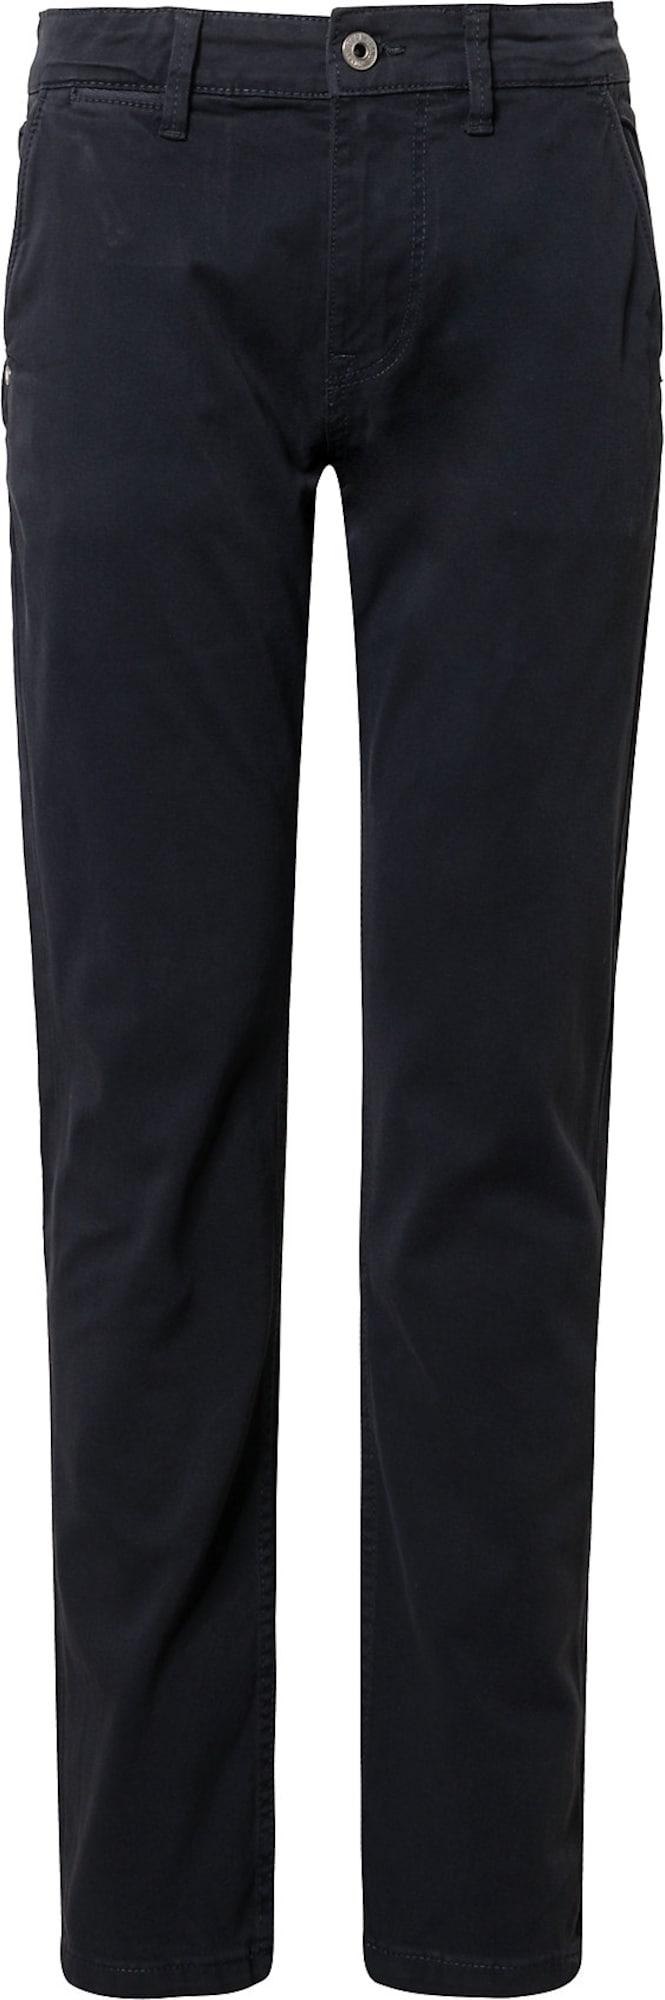 Pepe Jeans Kelnės 'GREENWICH' tamsiai mėlyna jūros spalva